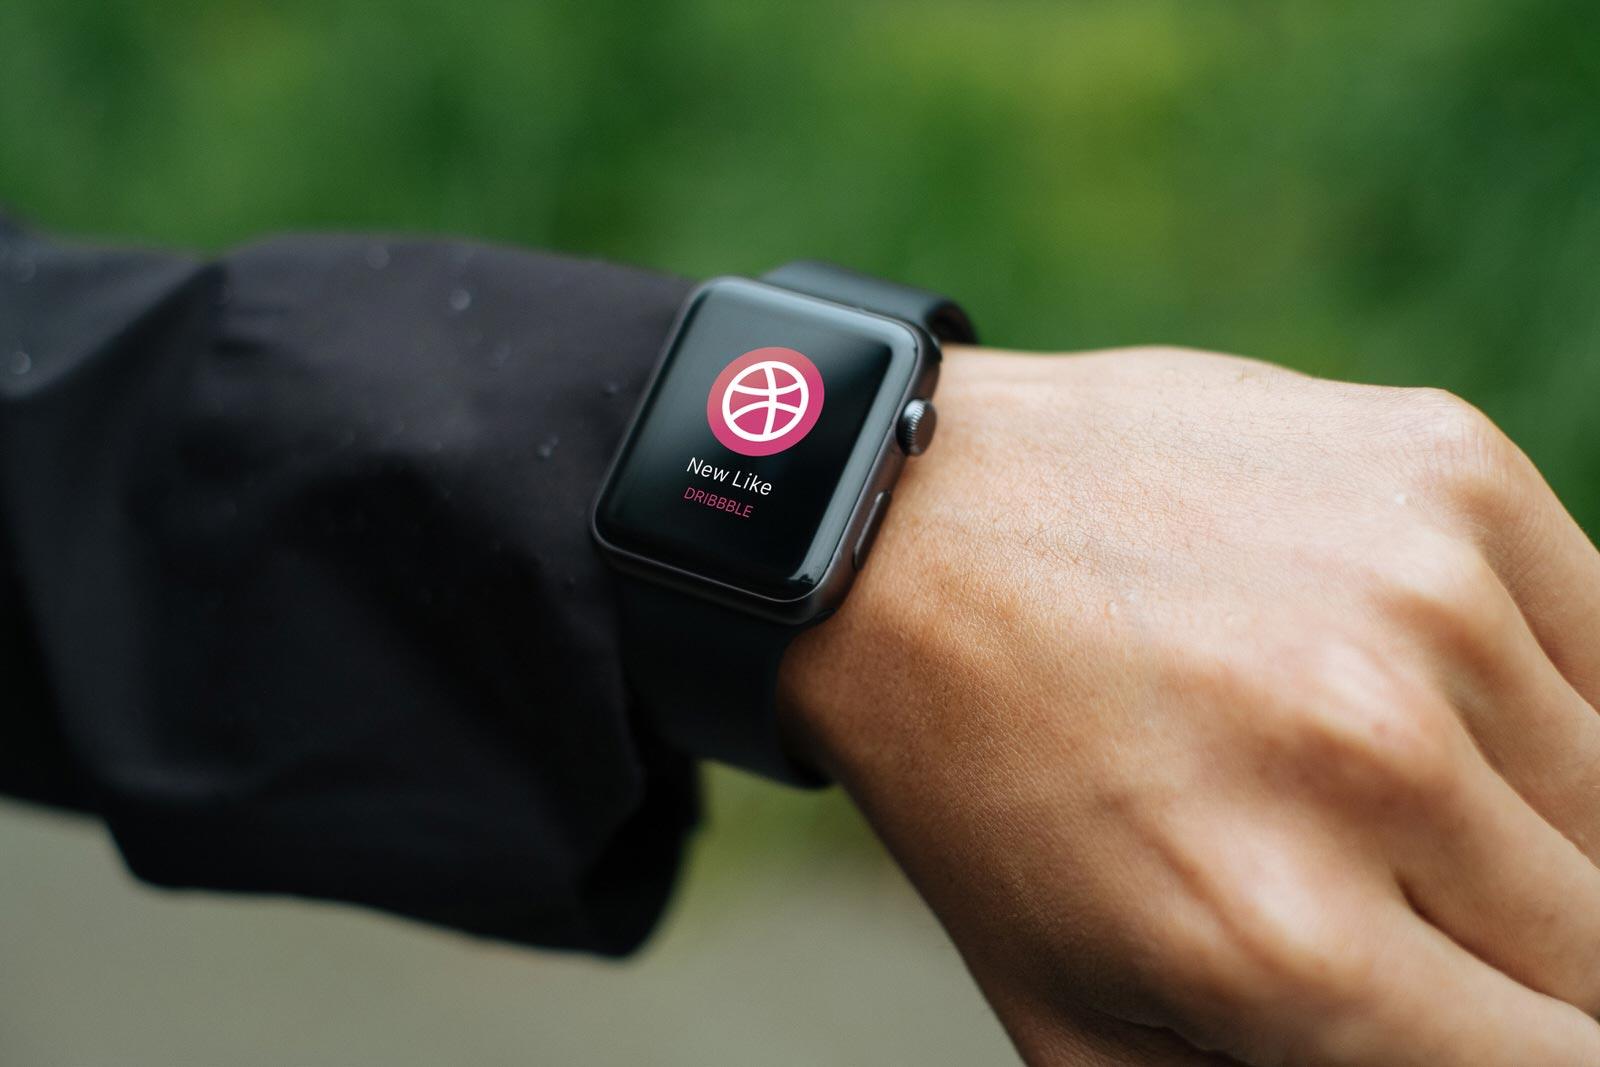 Free Apple Watch Photo Mockup PSD (2)